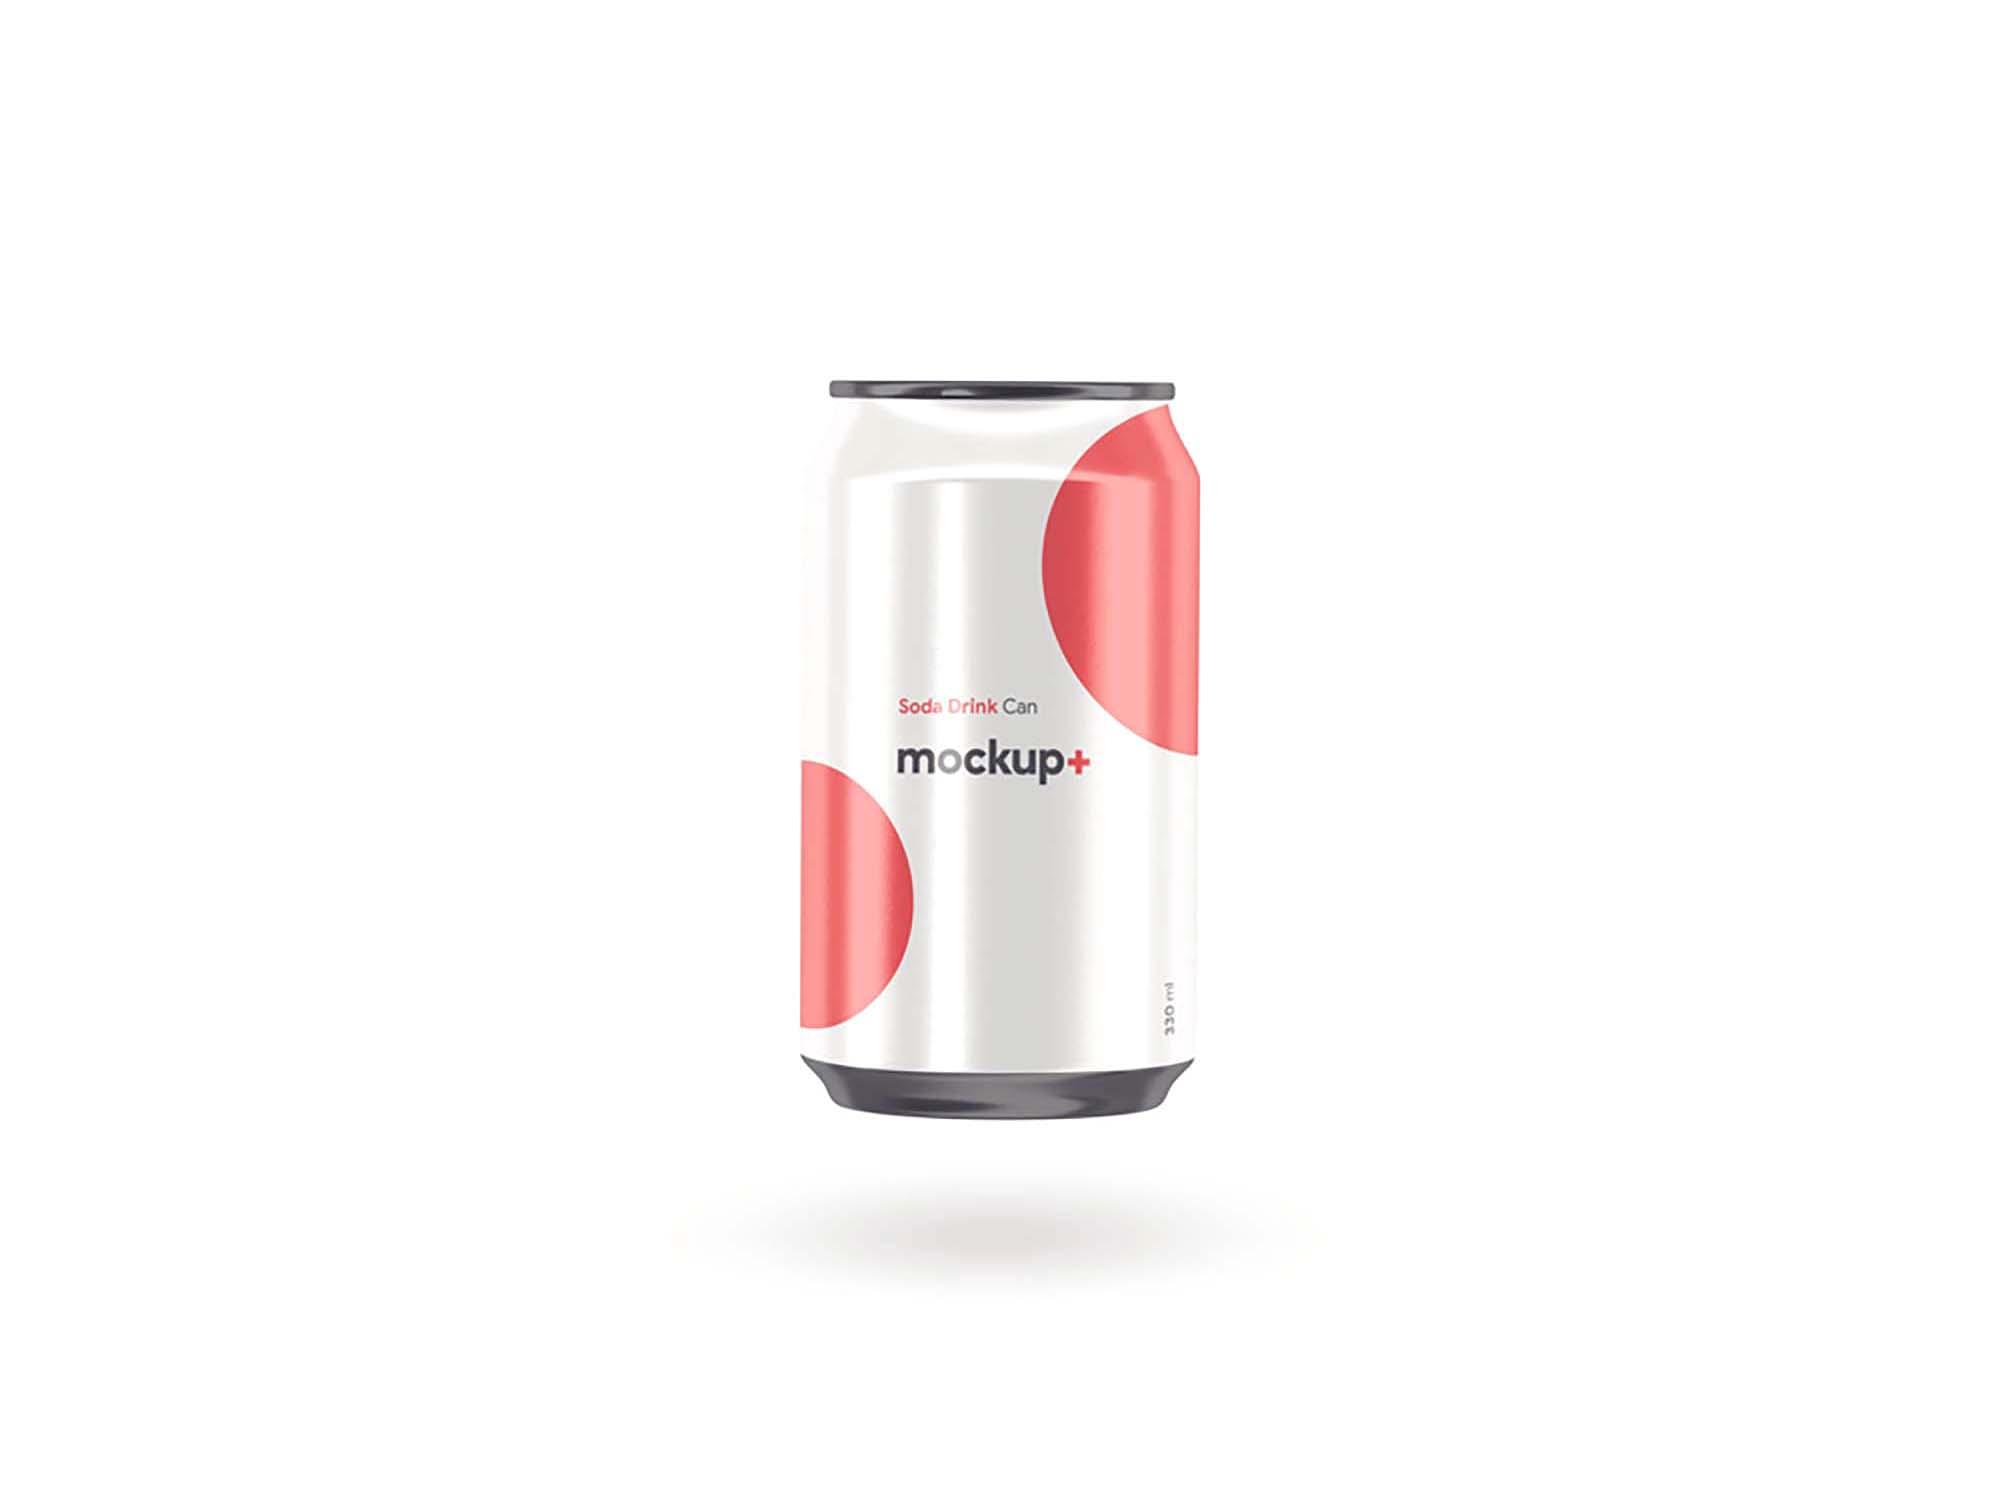 Soda Drink Can Mockup 3